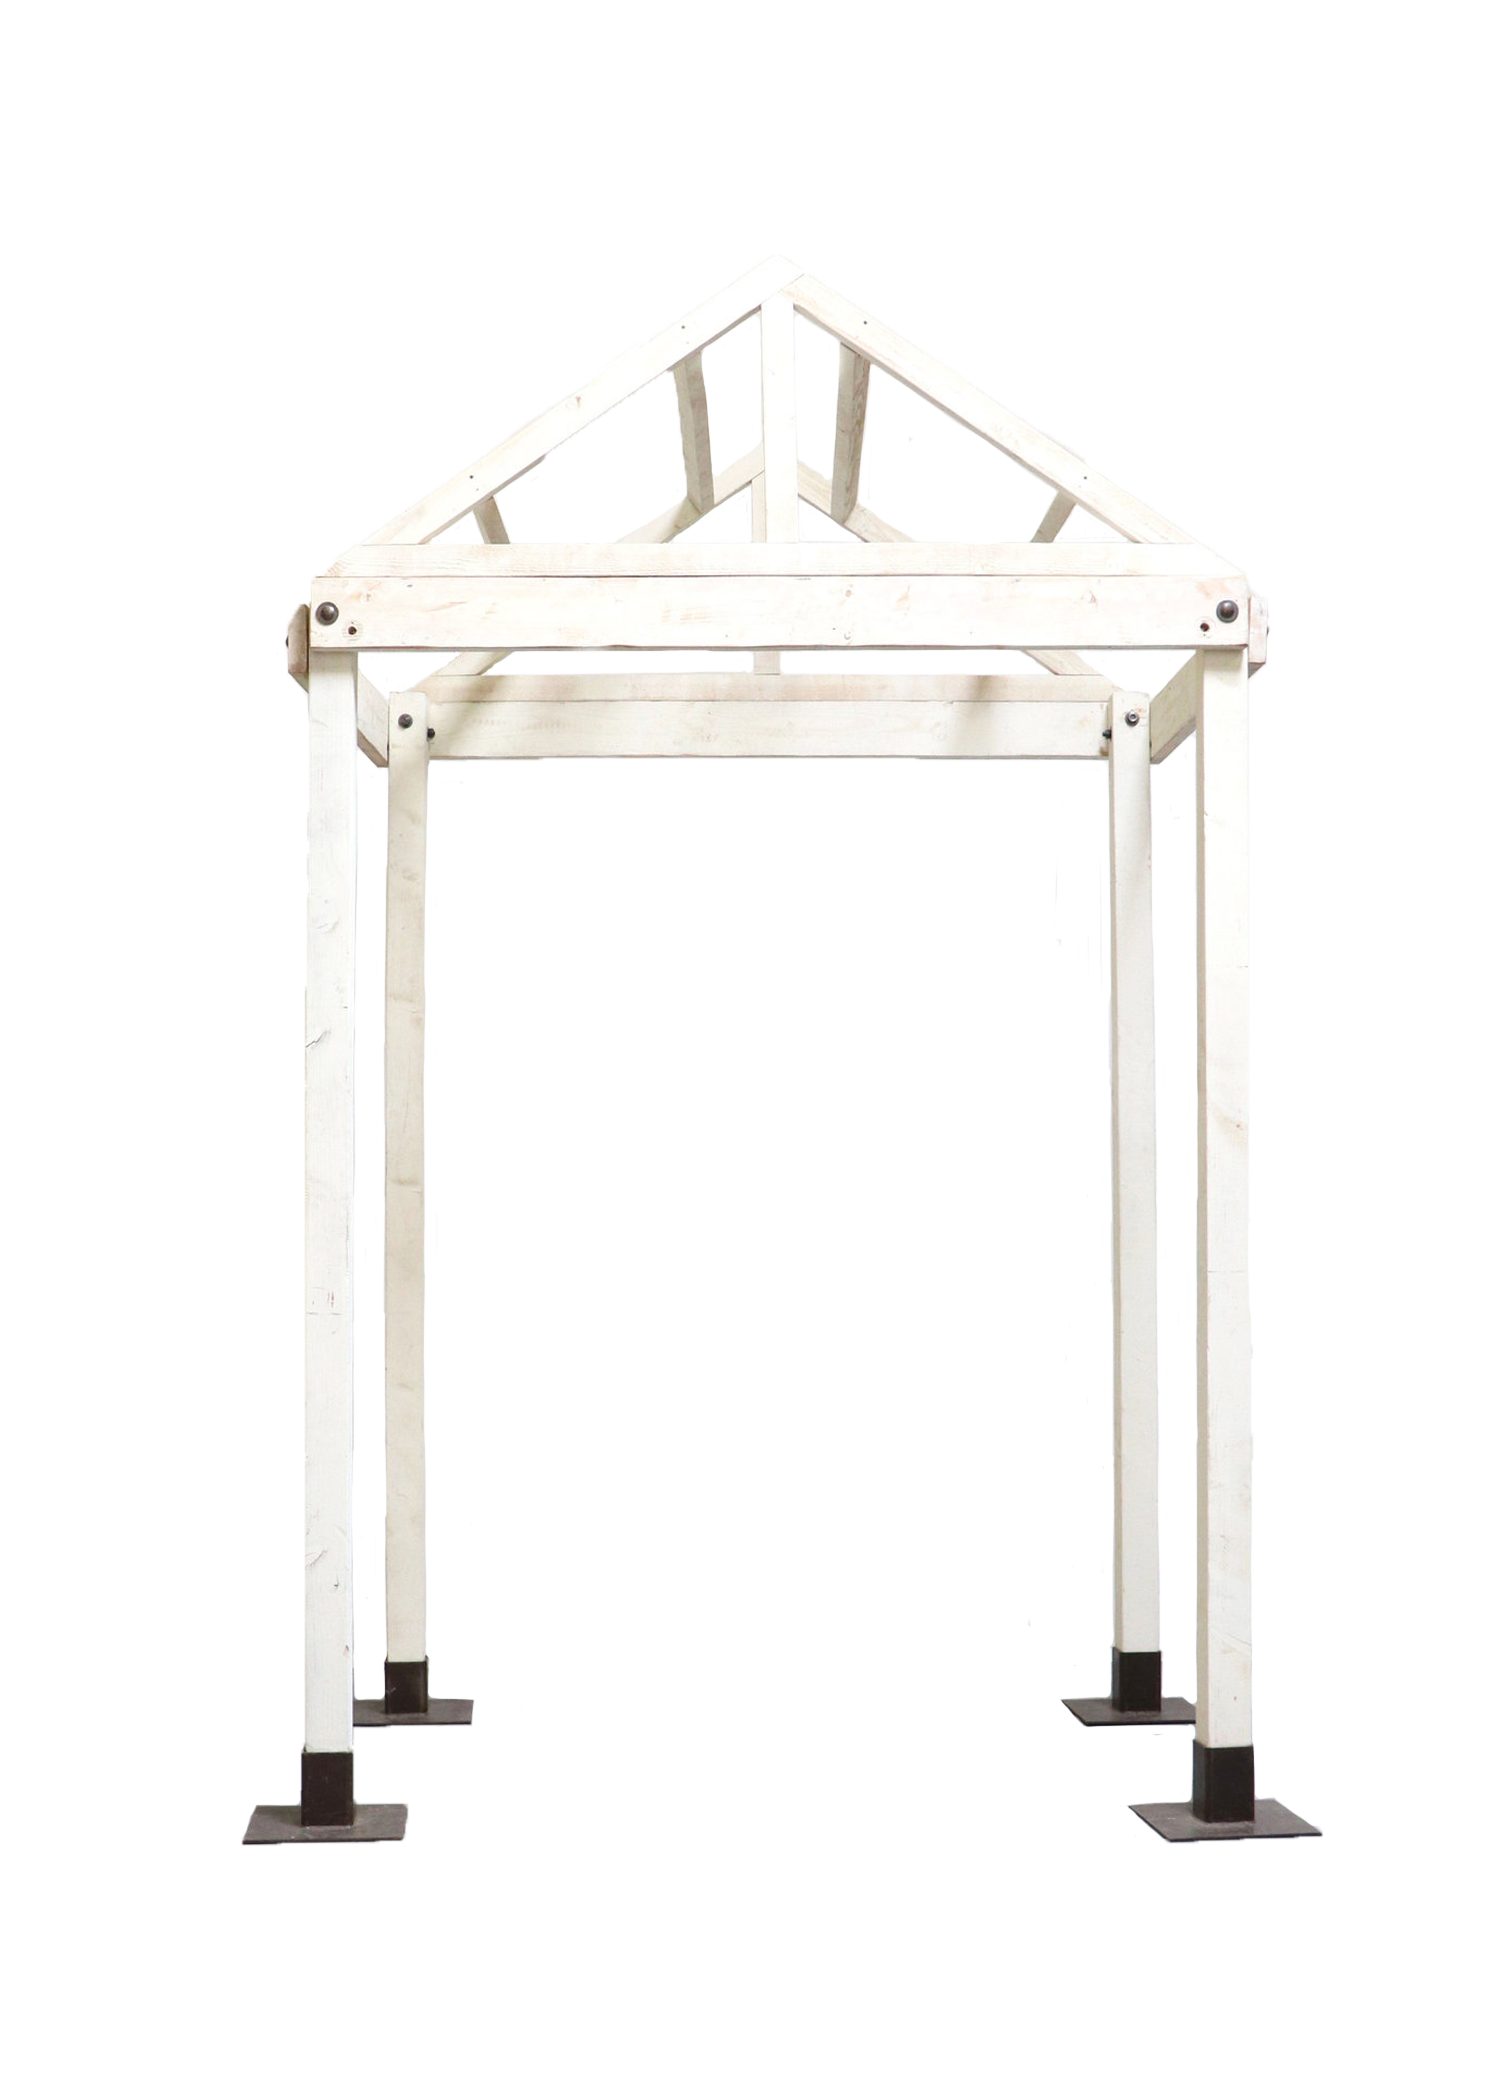 Steeple Arch